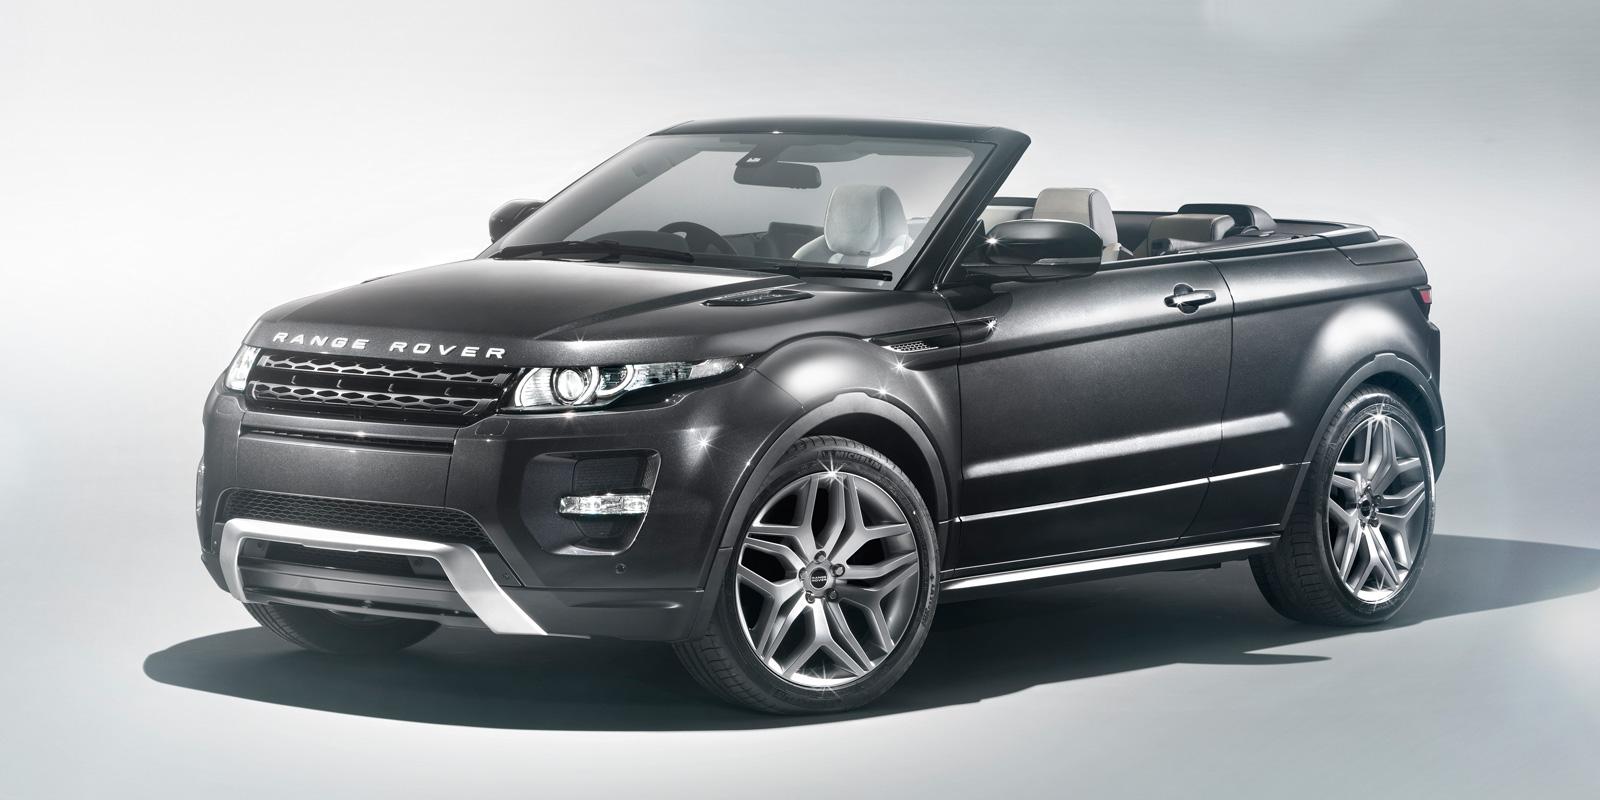 Range Rover Evoque Autosmr